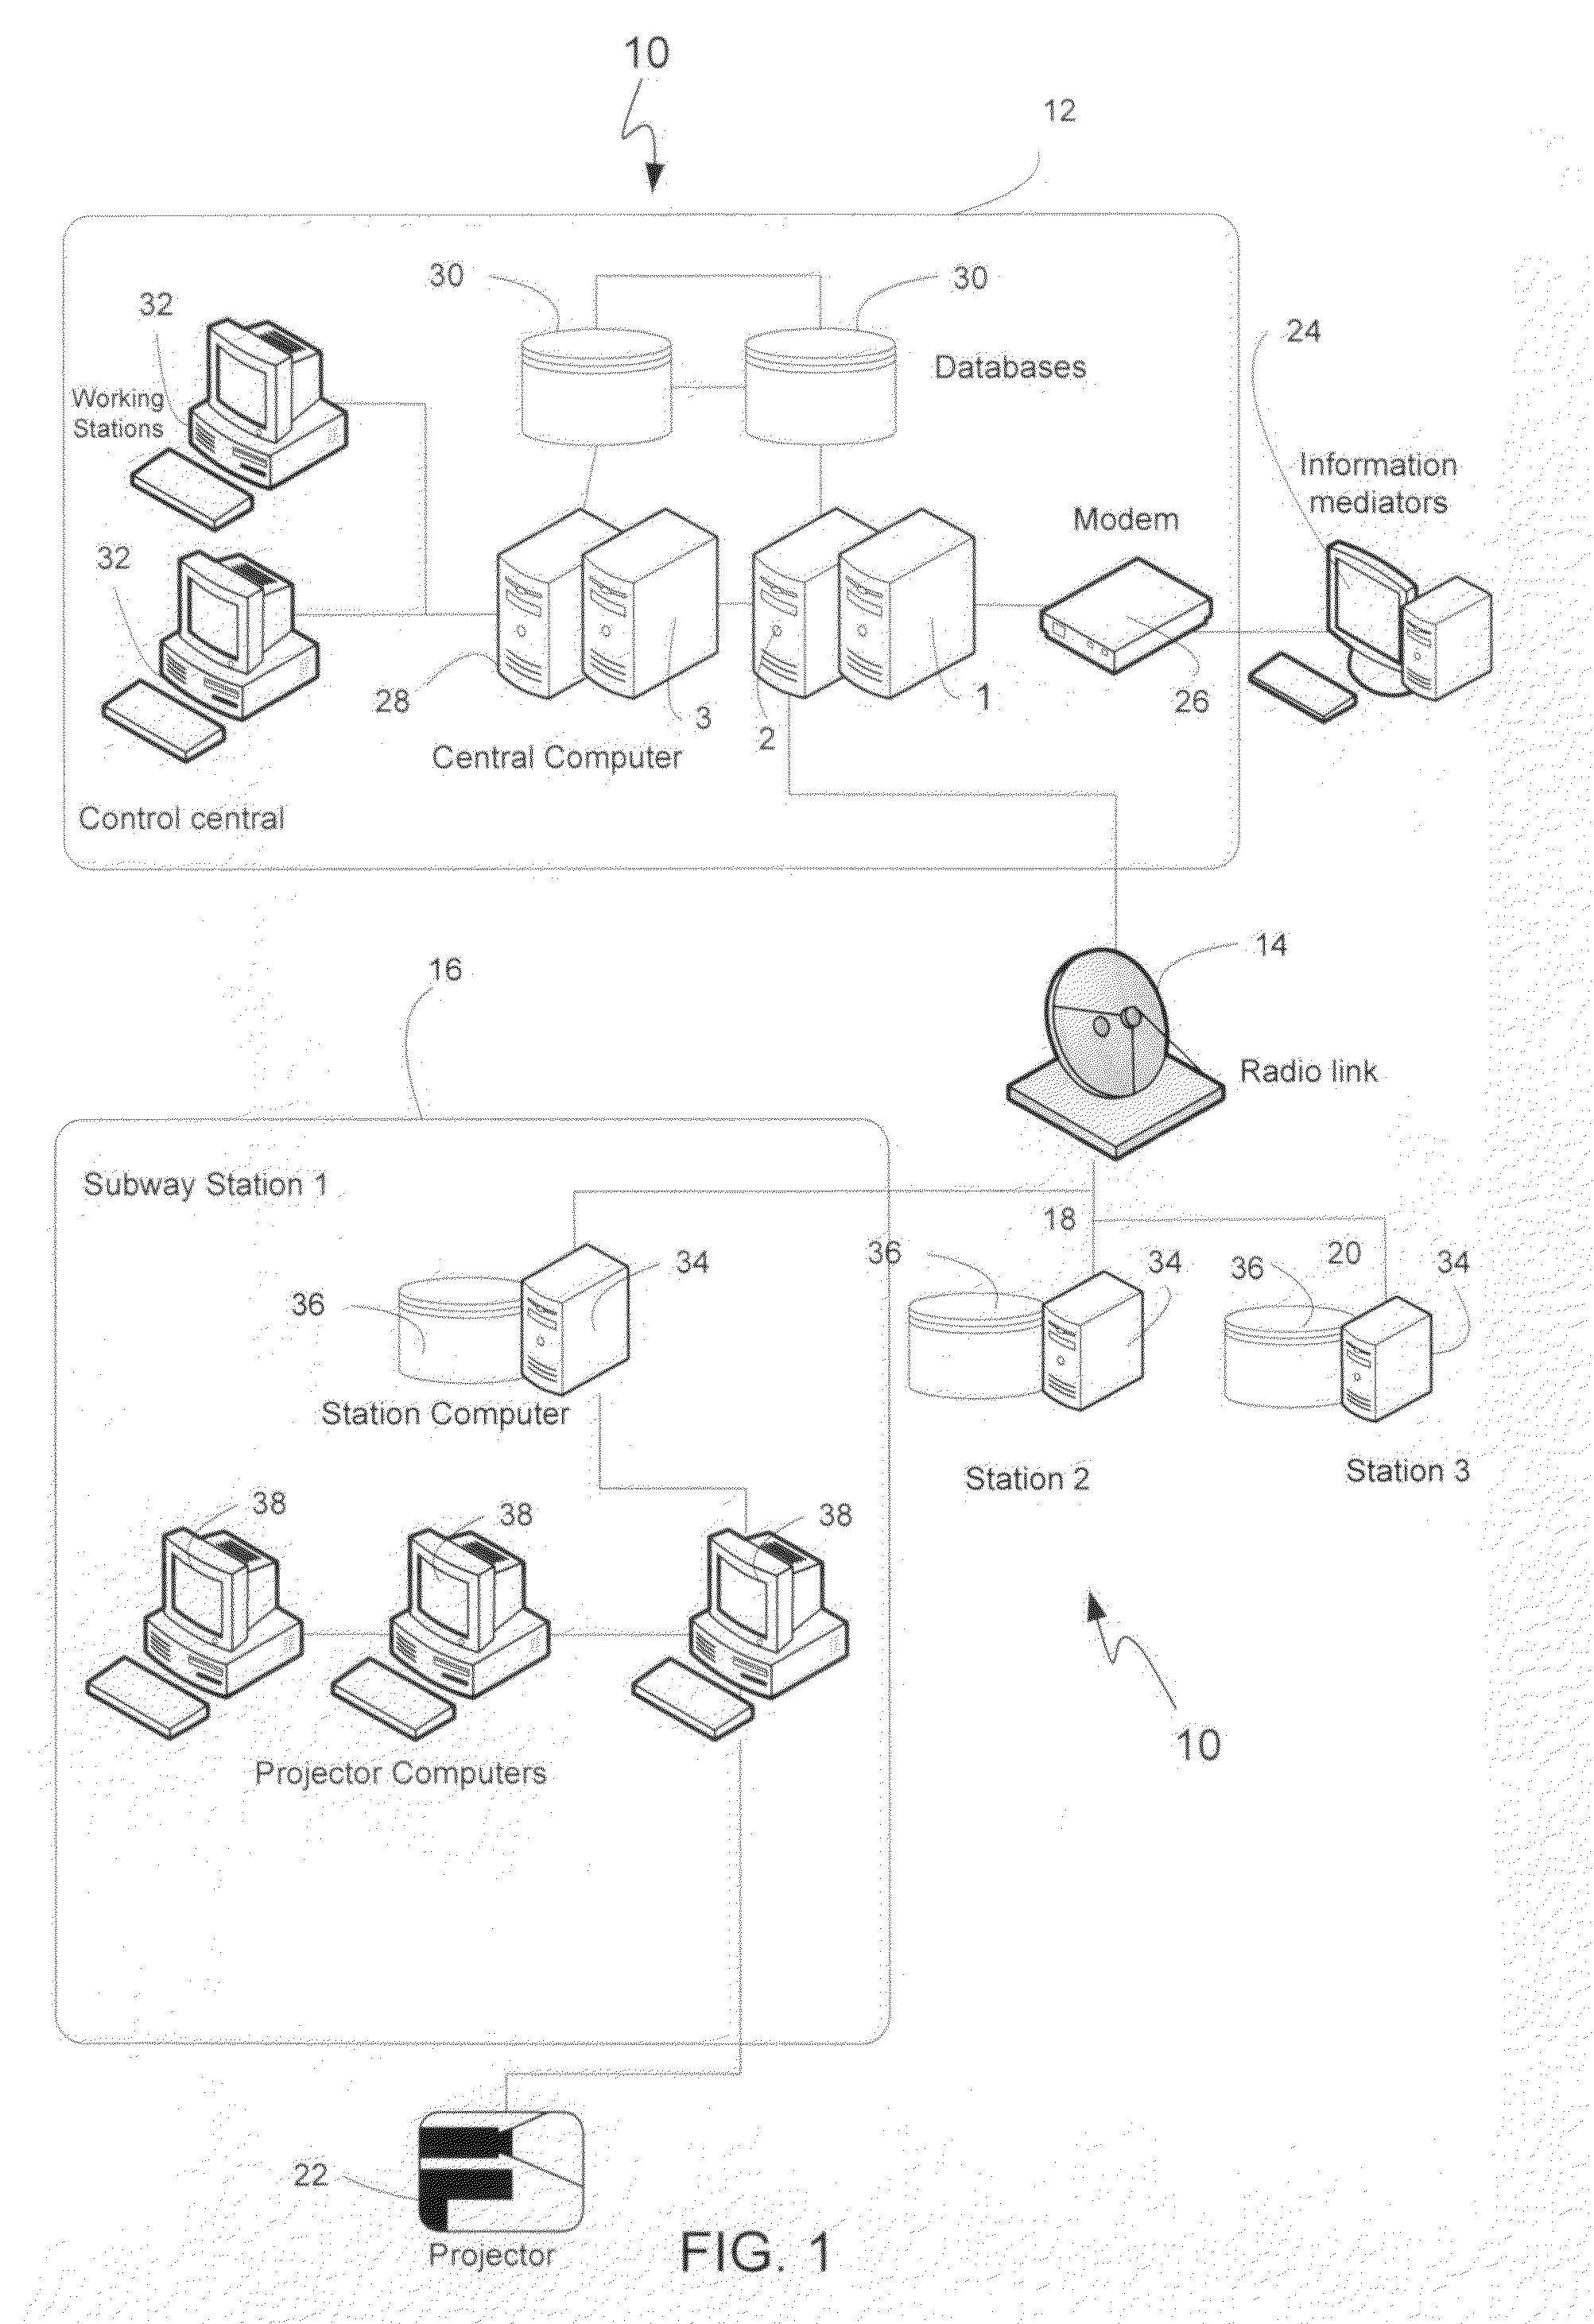 digital information system